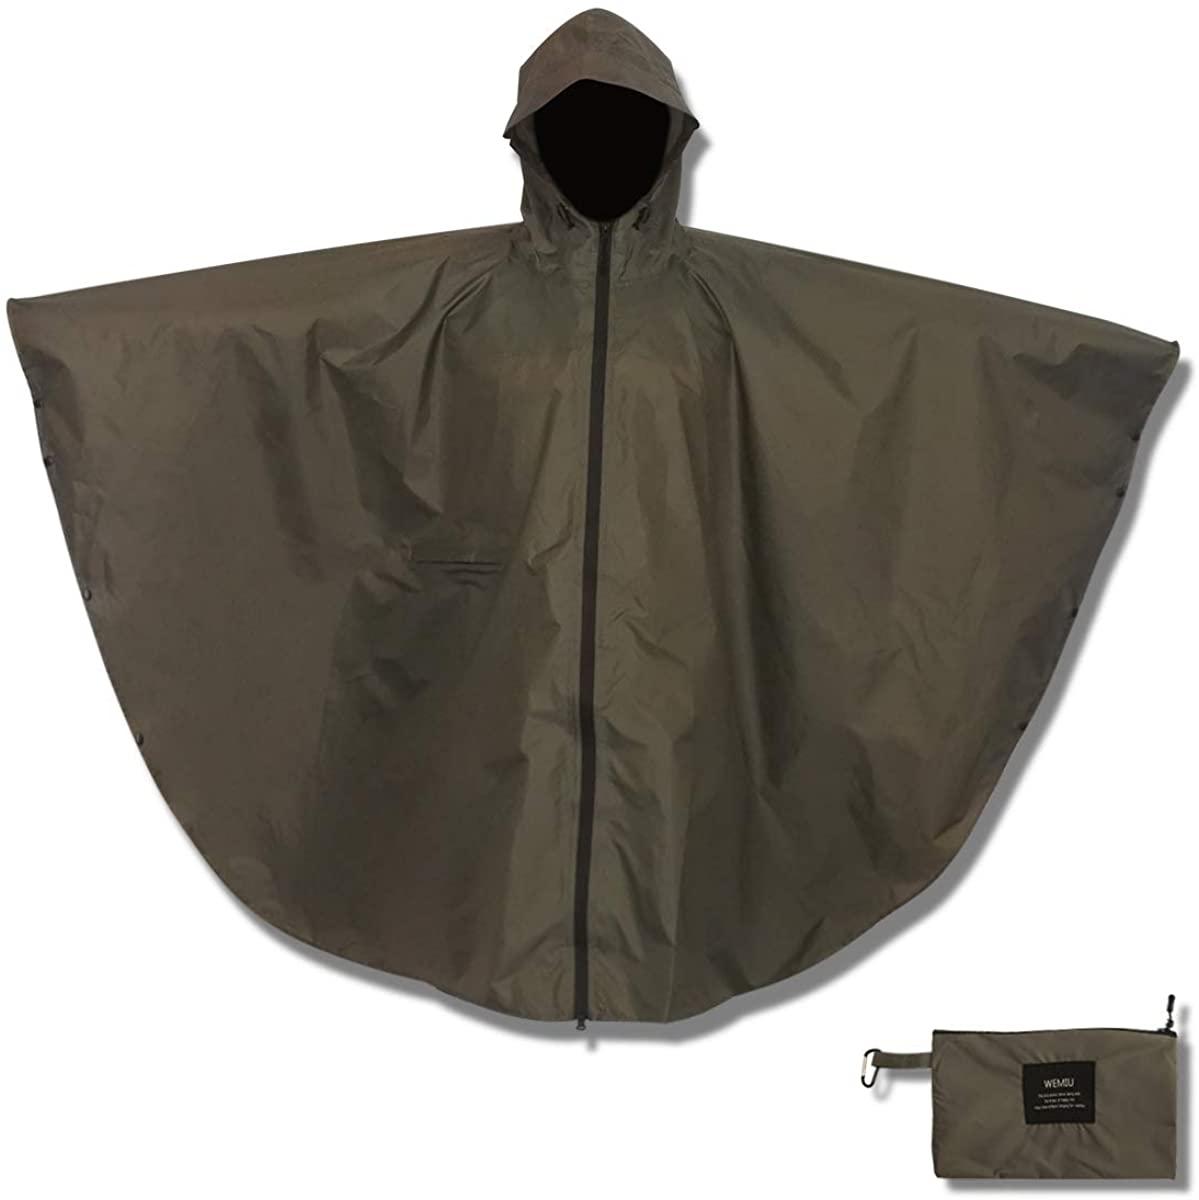 RainRider Rain Poncho for Adults Waterproof Lightweight Rain Gear Travel Camping Emergency Military Rain Coat Jacket